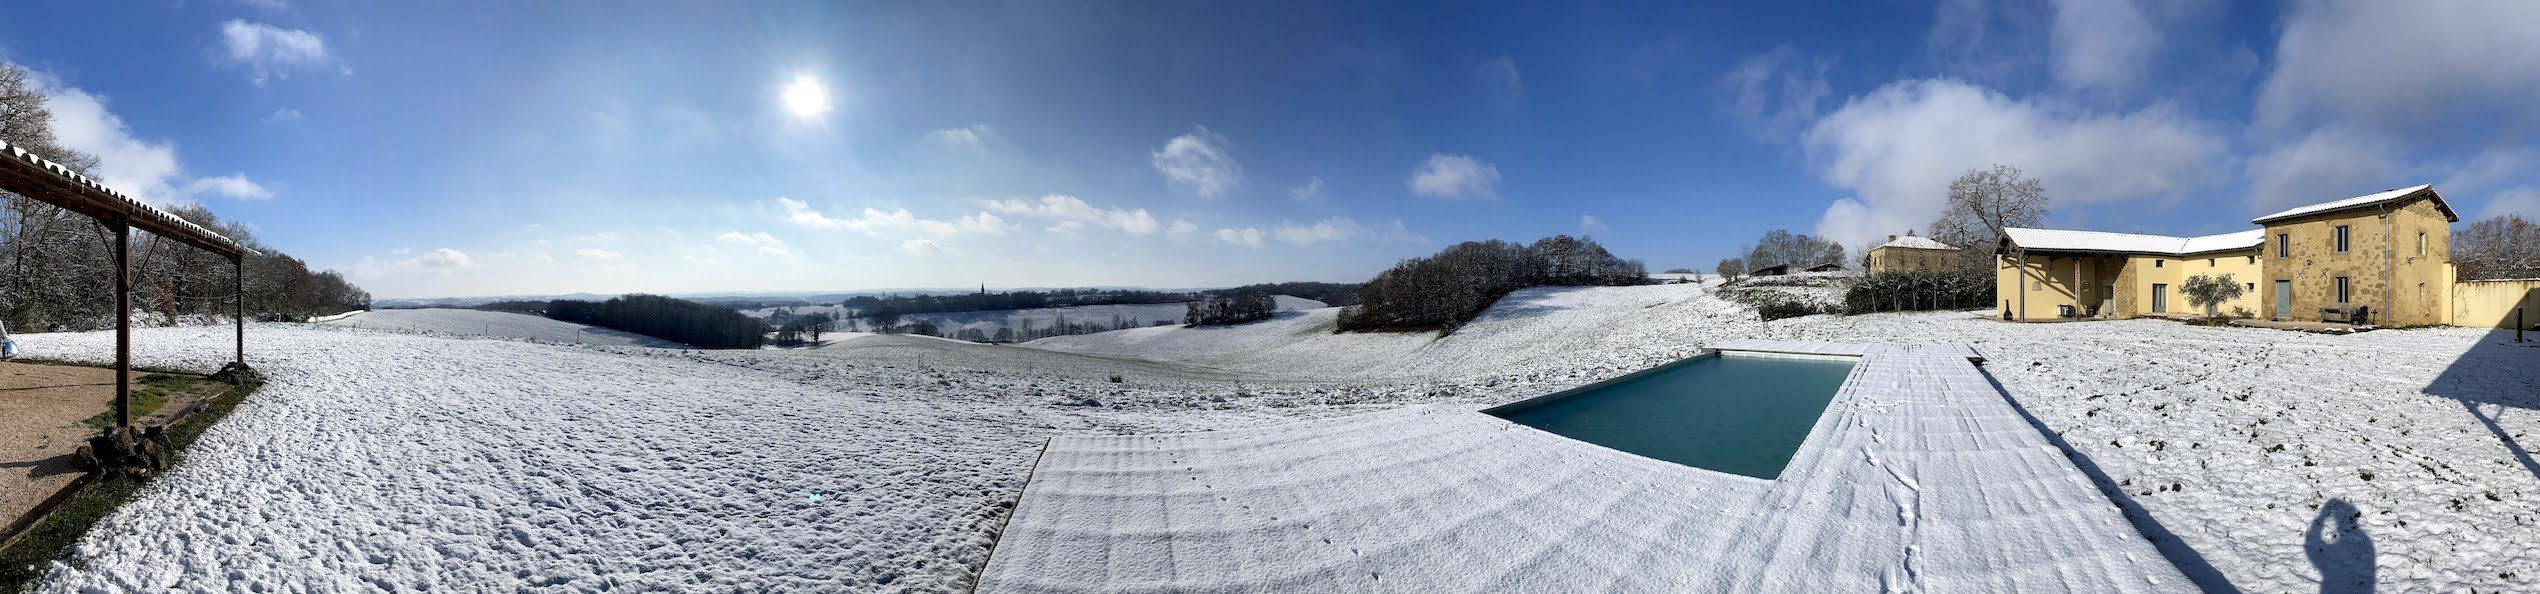 Maison vivre plus in de sneeuw